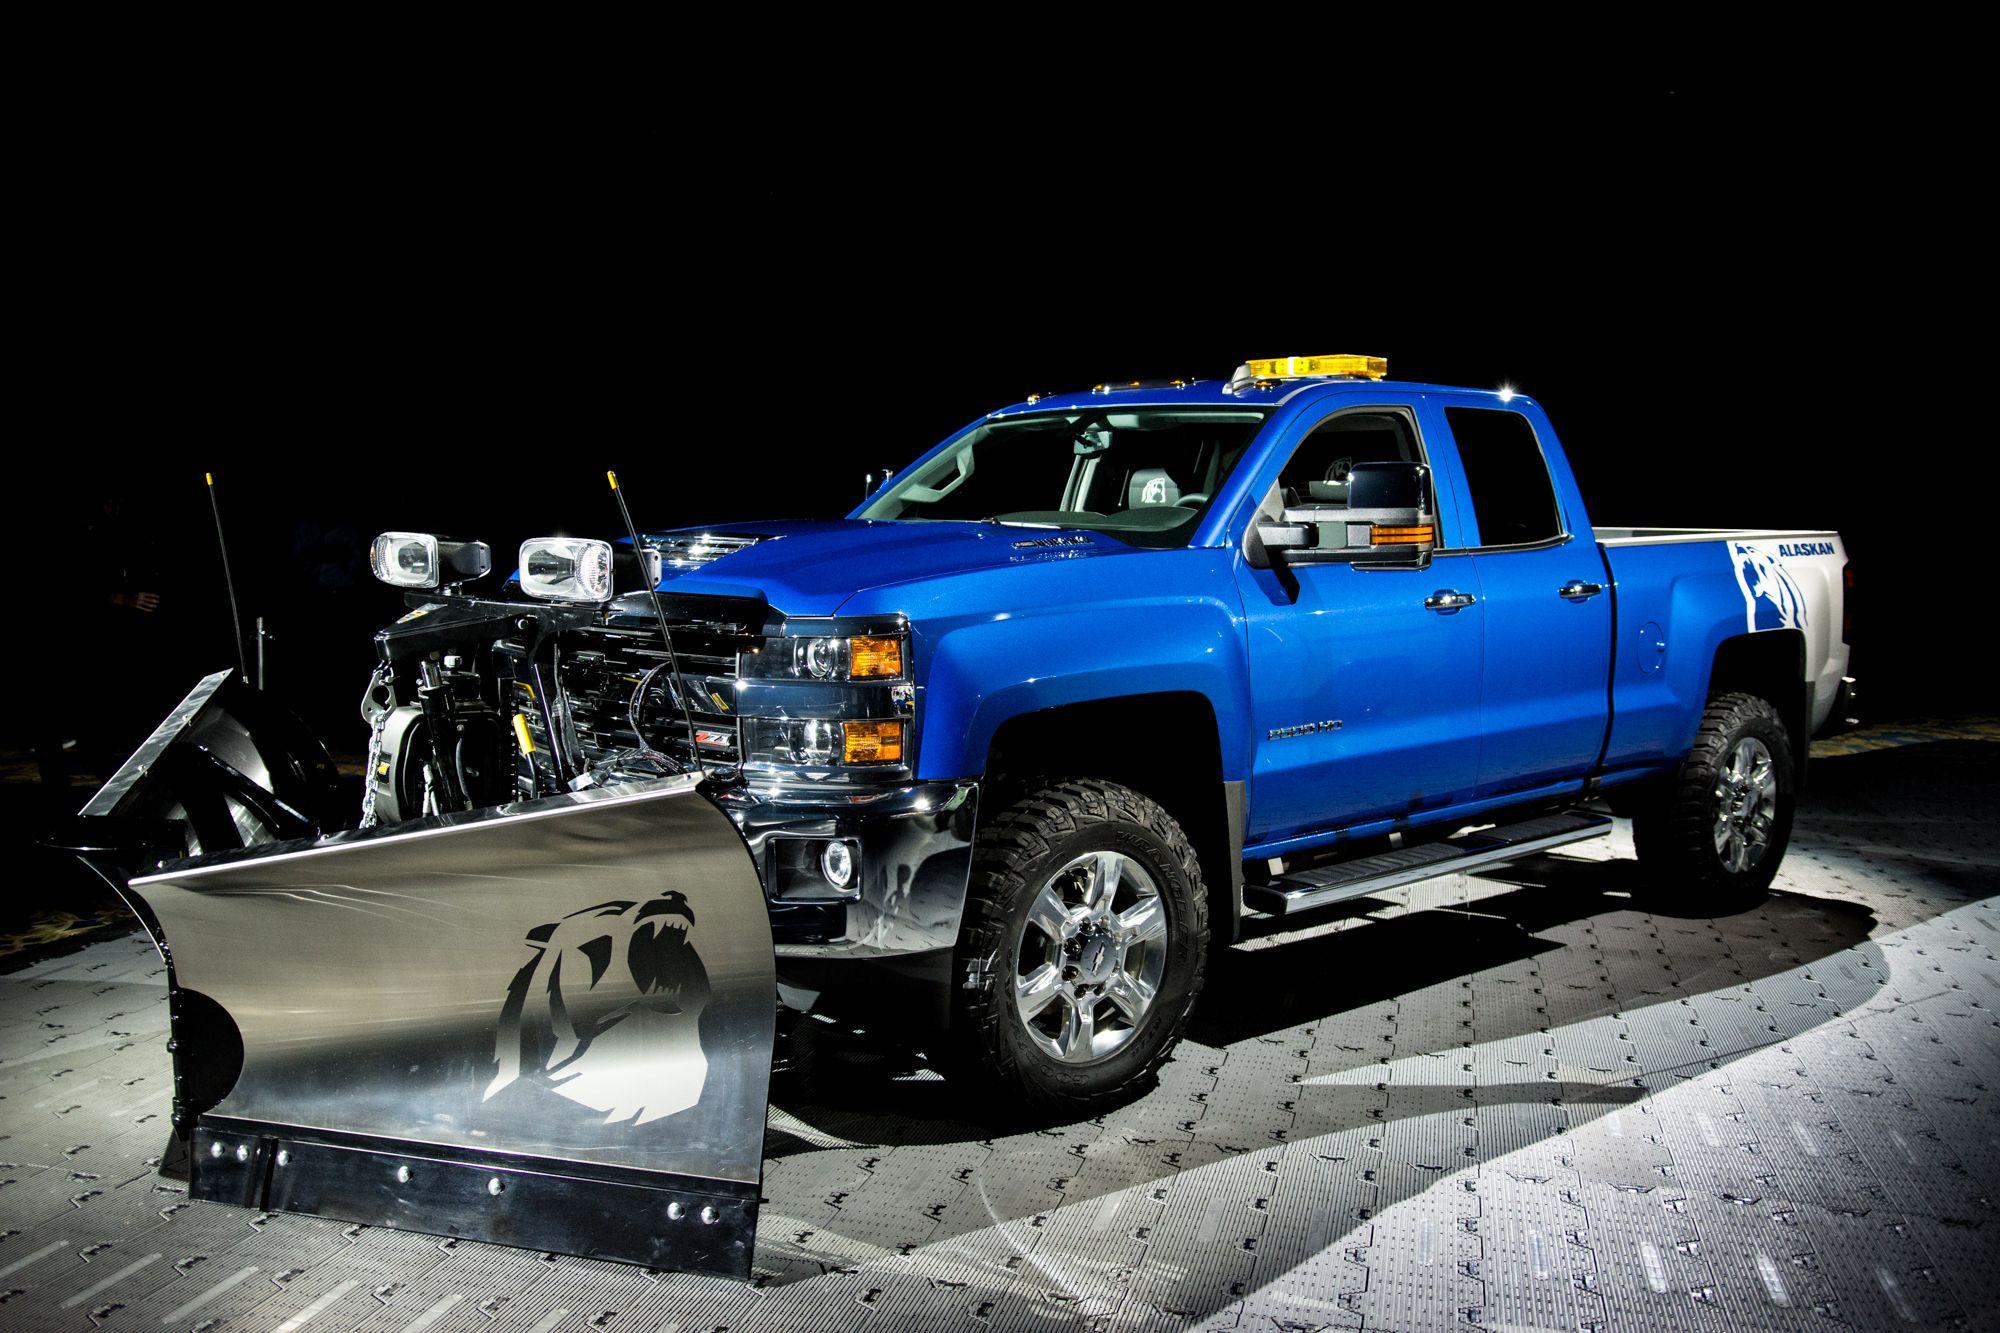 Chevy unveils grizzly of a truck Silverado 2500HD Alaskan